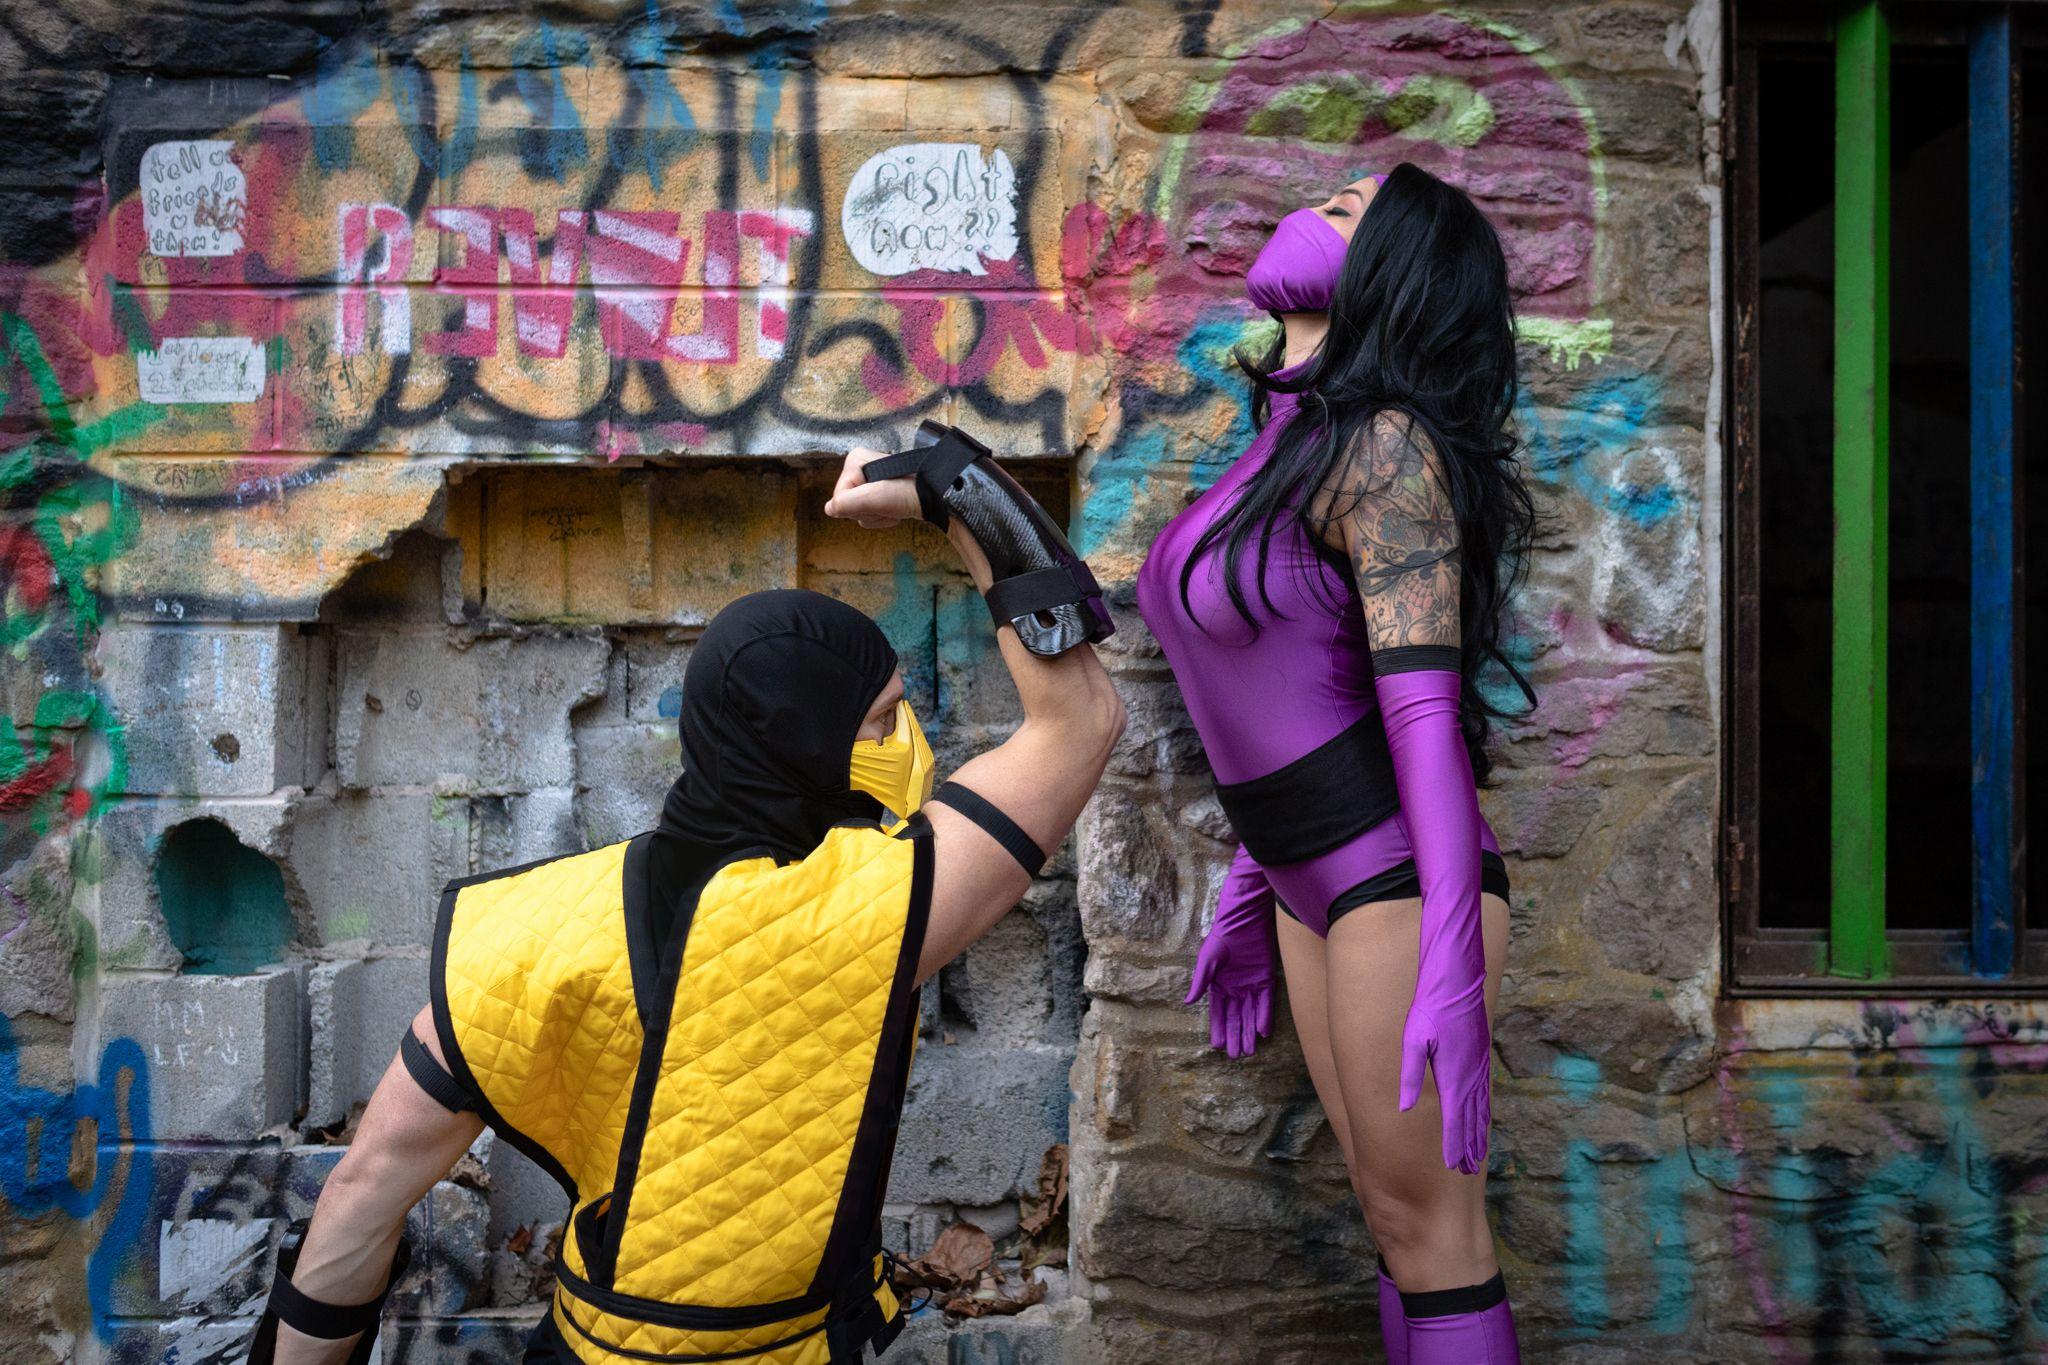 Mortal Kombat : Mileena | Mortal kombat, Mortal kombat